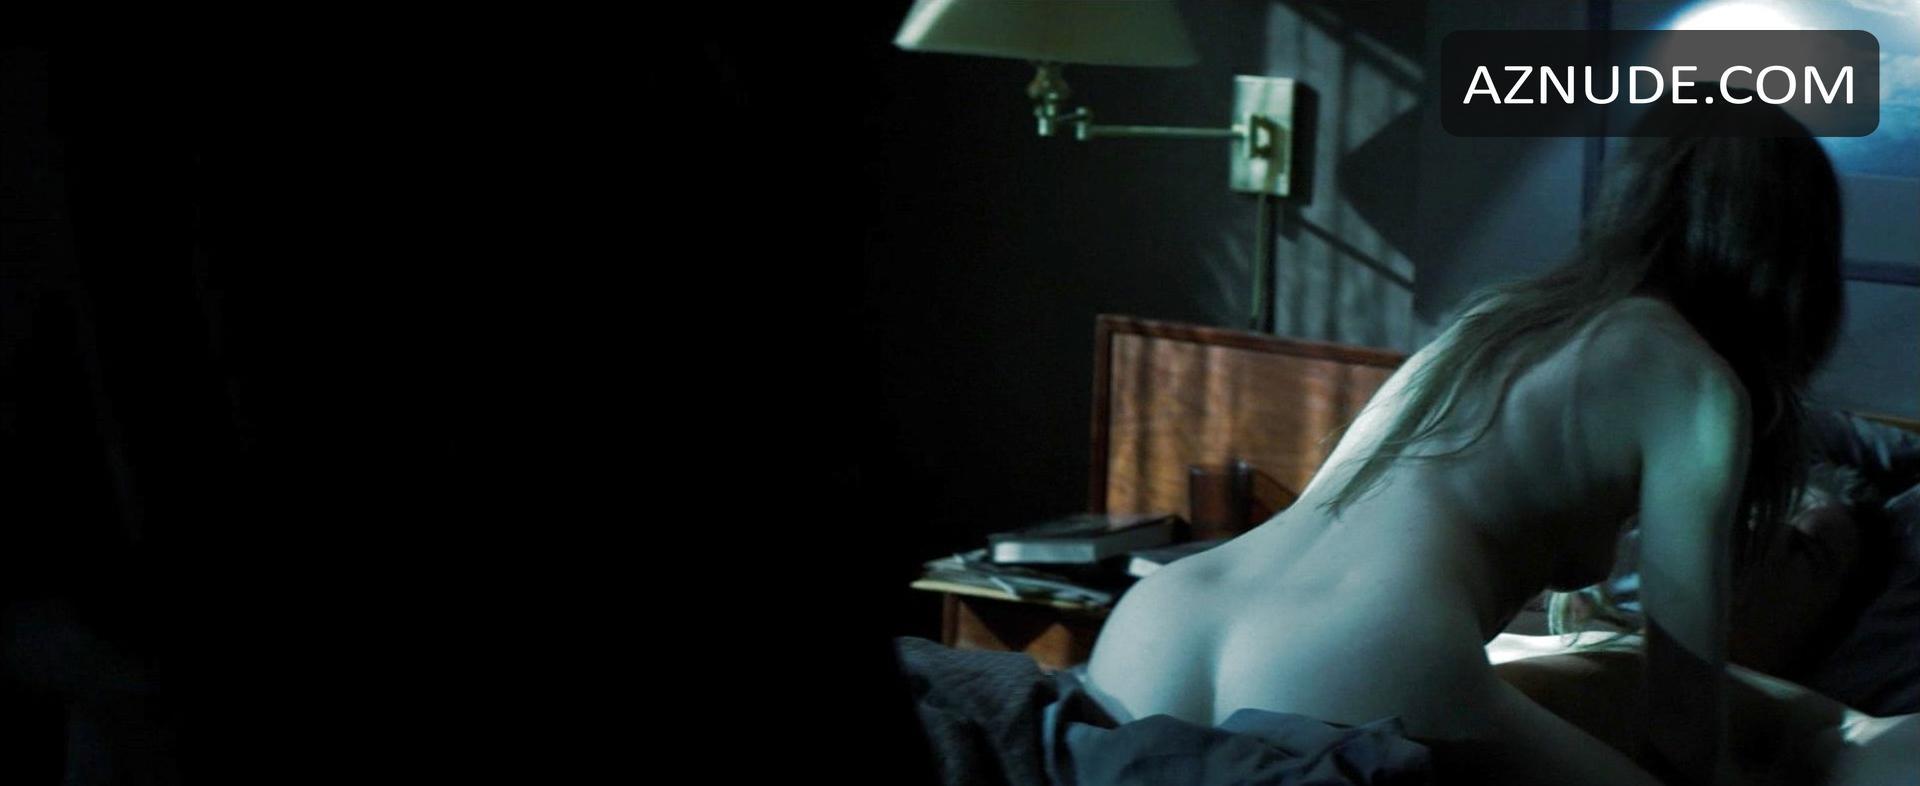 Emma watson nude scene regression